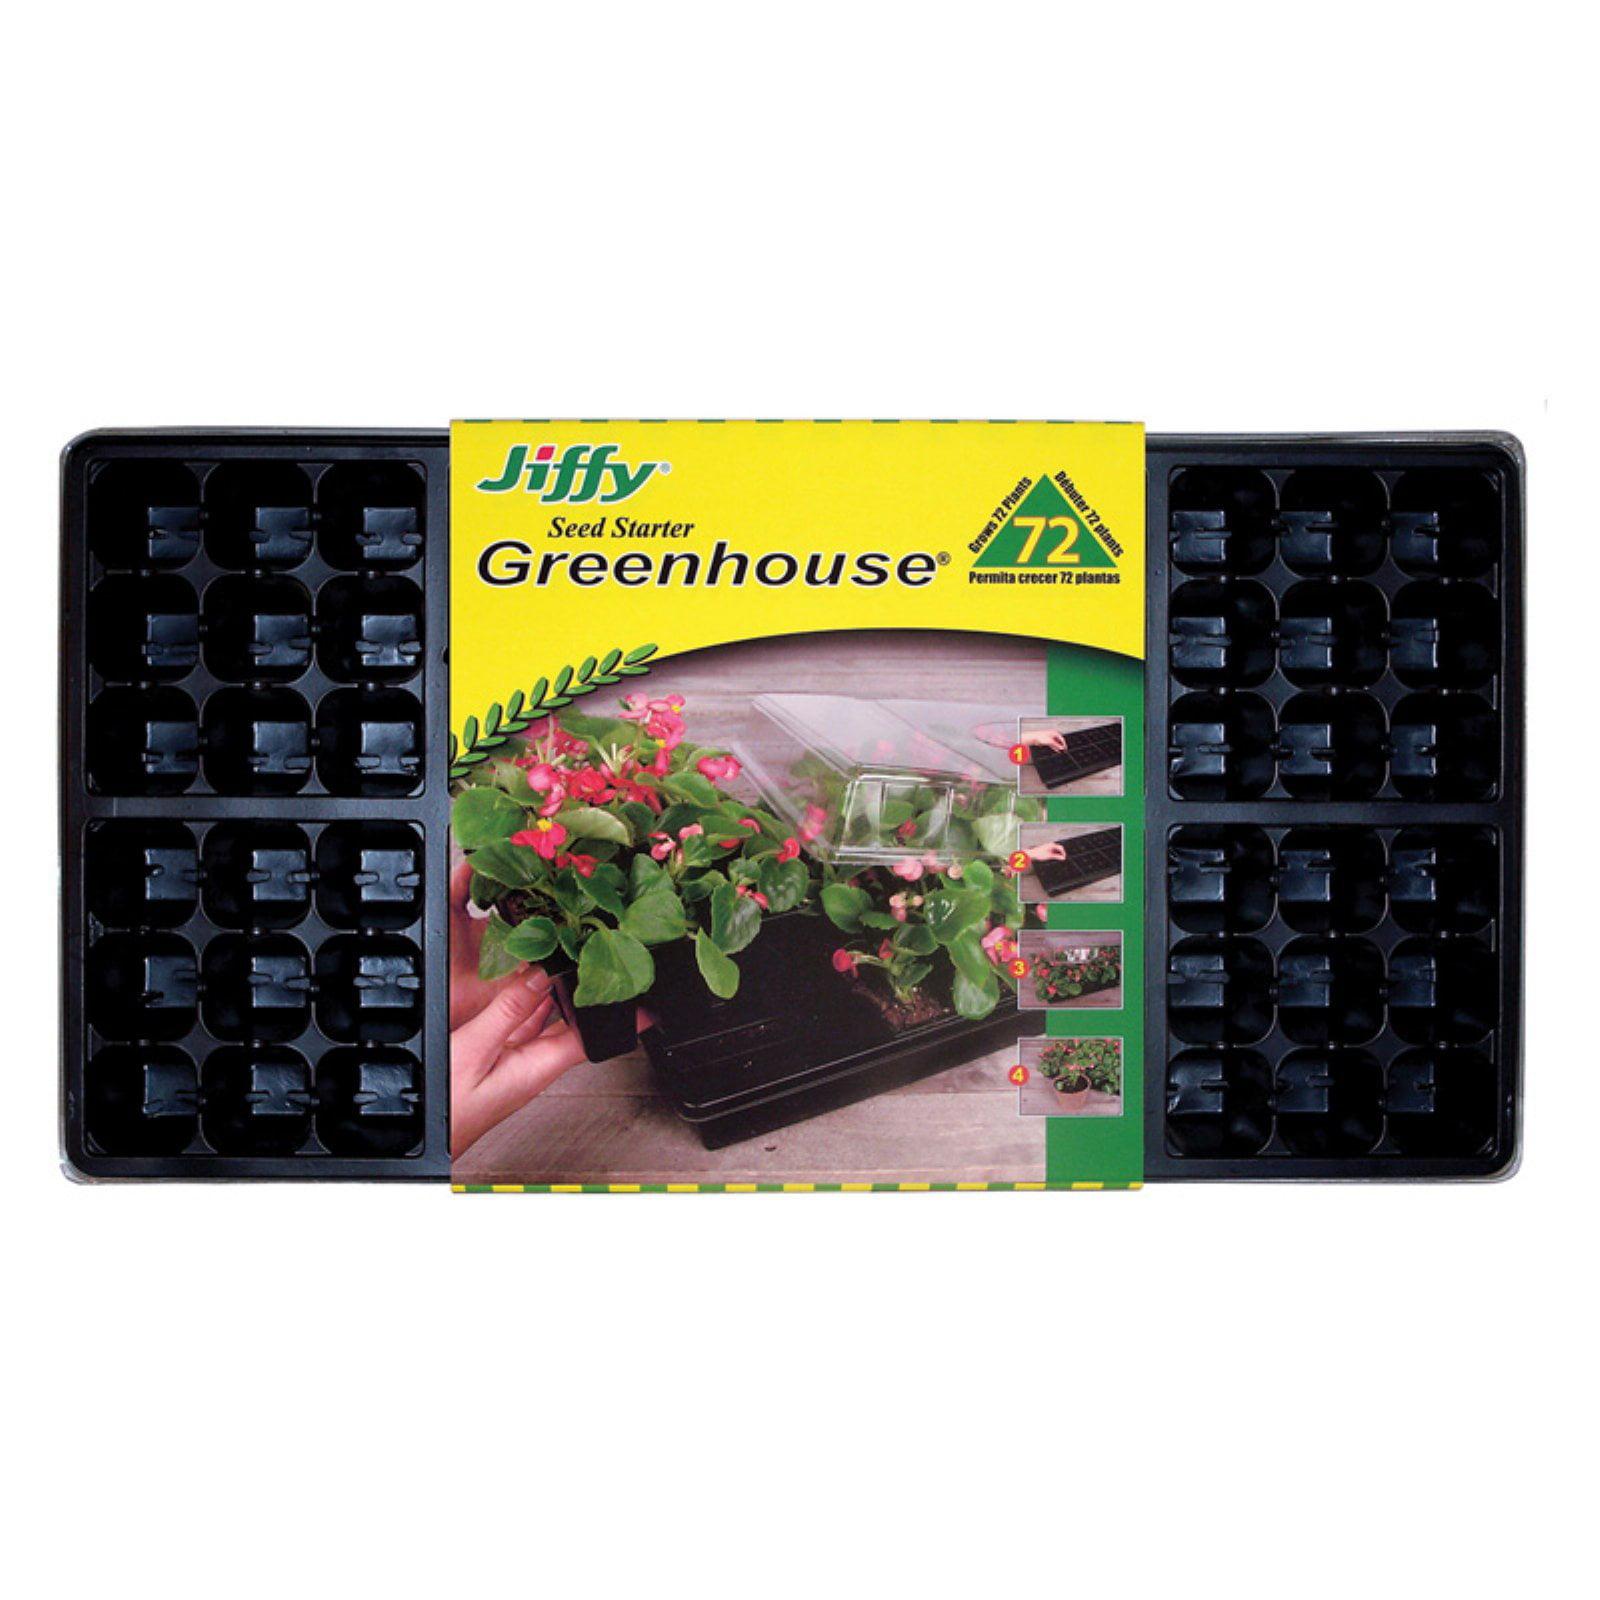 Jiffy T72H Jiffy Easy Grow Greenhouse by Ferry Morse/Jiffy